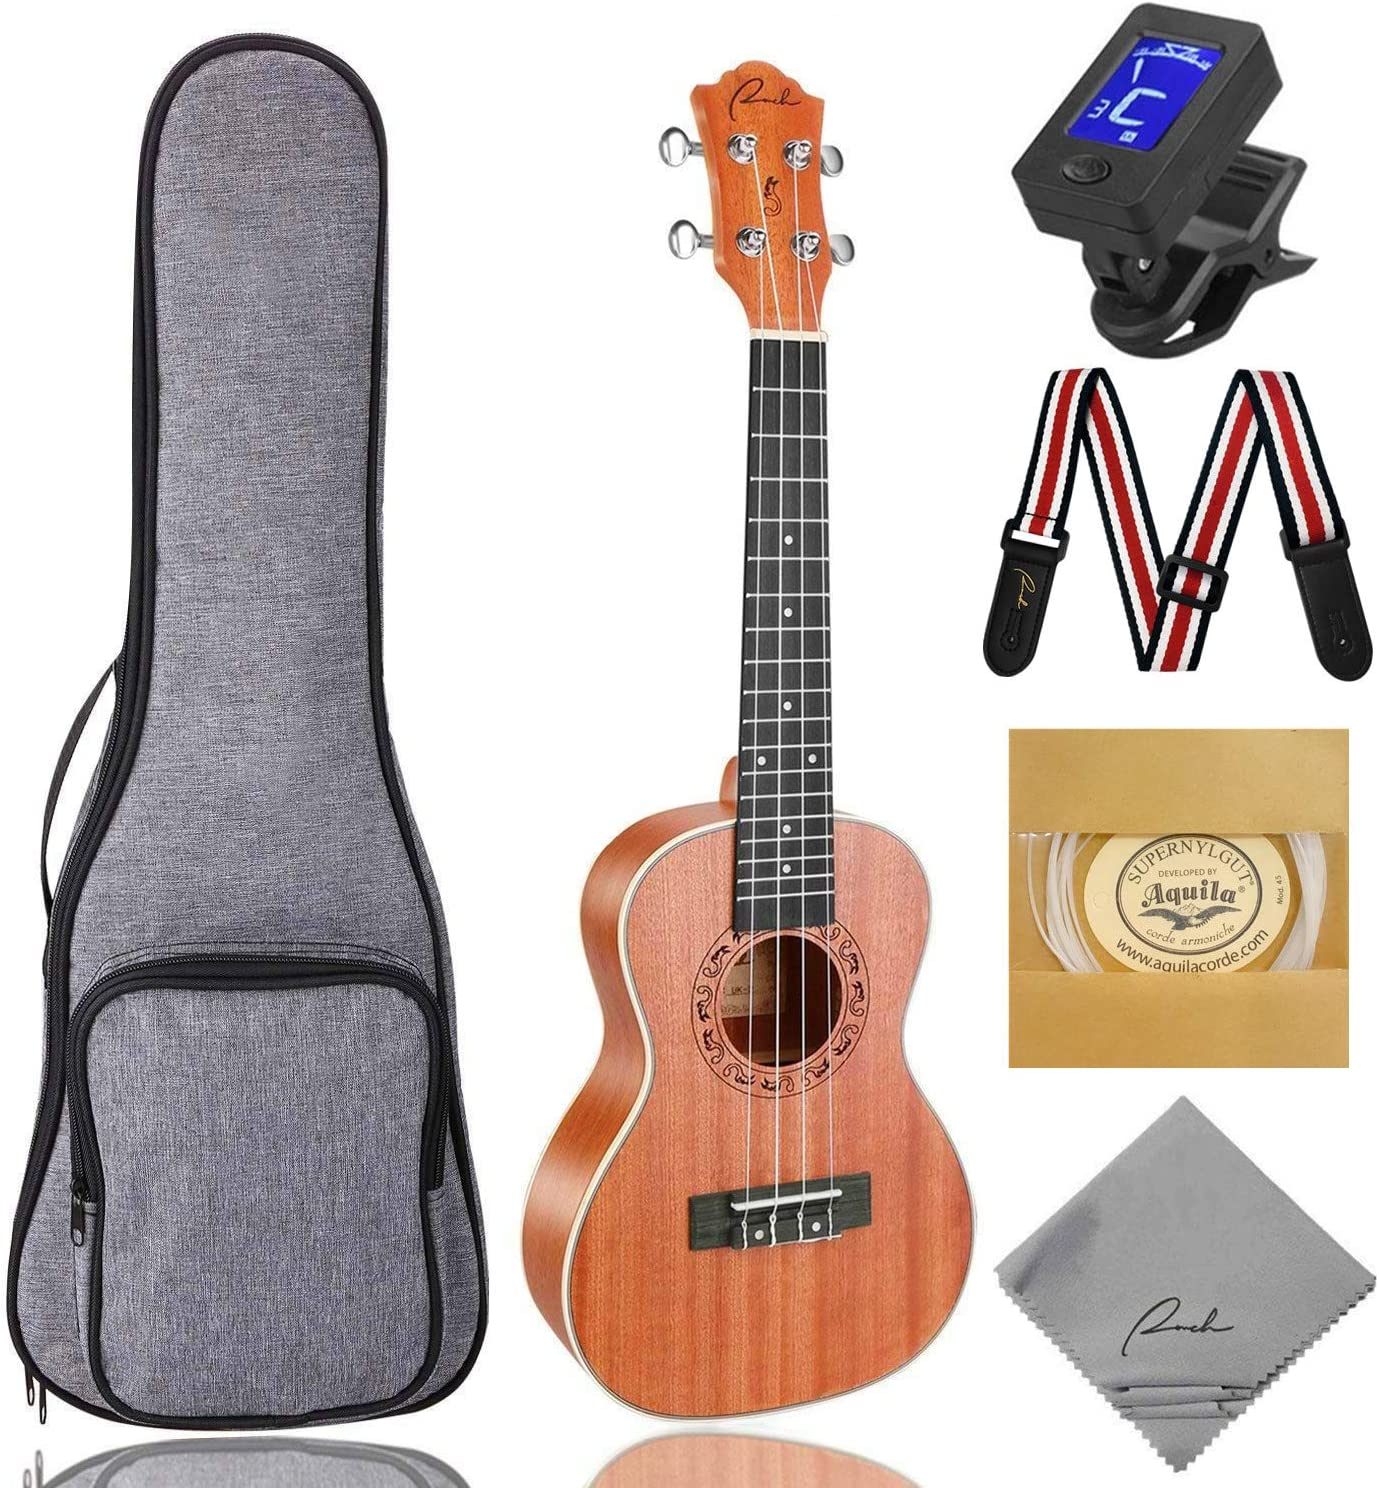 B073Q6KLGQ Concert Ukulele Ranch 23 inch Professional Wooden ukelele Instrument Kit With Free Online 12 Lessons Small Hawaiian Guitar ukalalee Pack Bundle Gig bag & Digital Tuner & Strap & 4 Aquila Strings Set 81RwNlph1aL